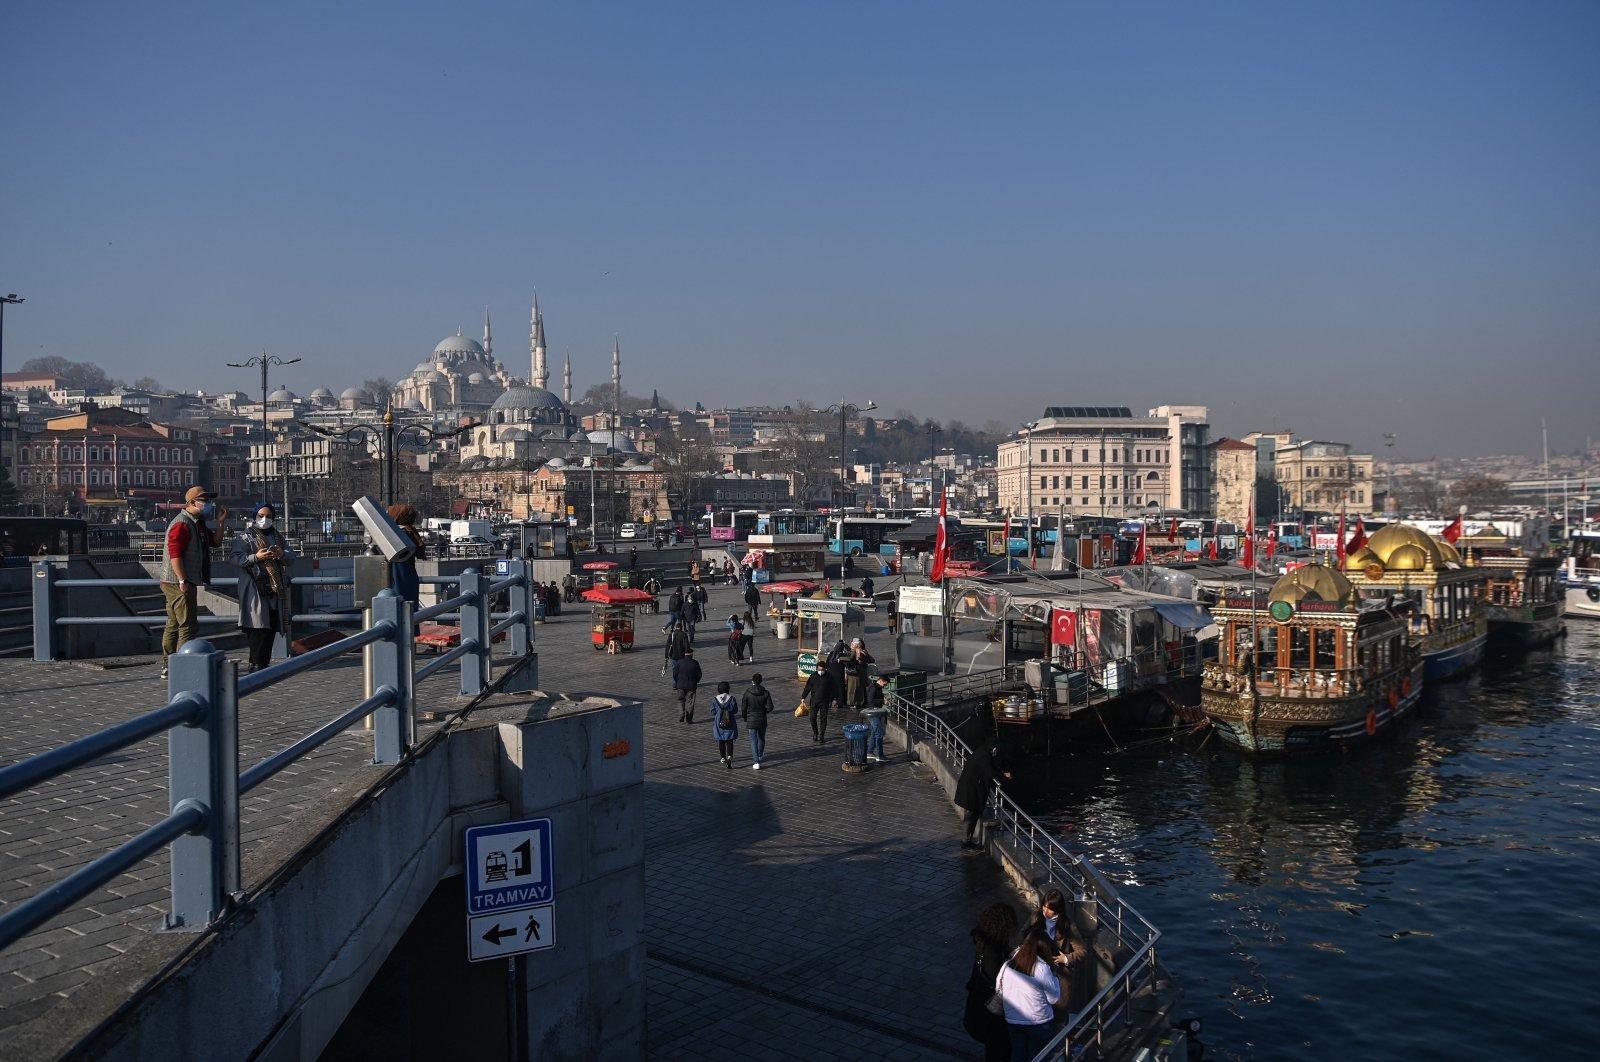 Fish vendors boats in the Eminönü neighborhood aginst Süleymaniye Mosque seen in the background, in Istanbul, Feb. 23, 2021. (AFP Photo)